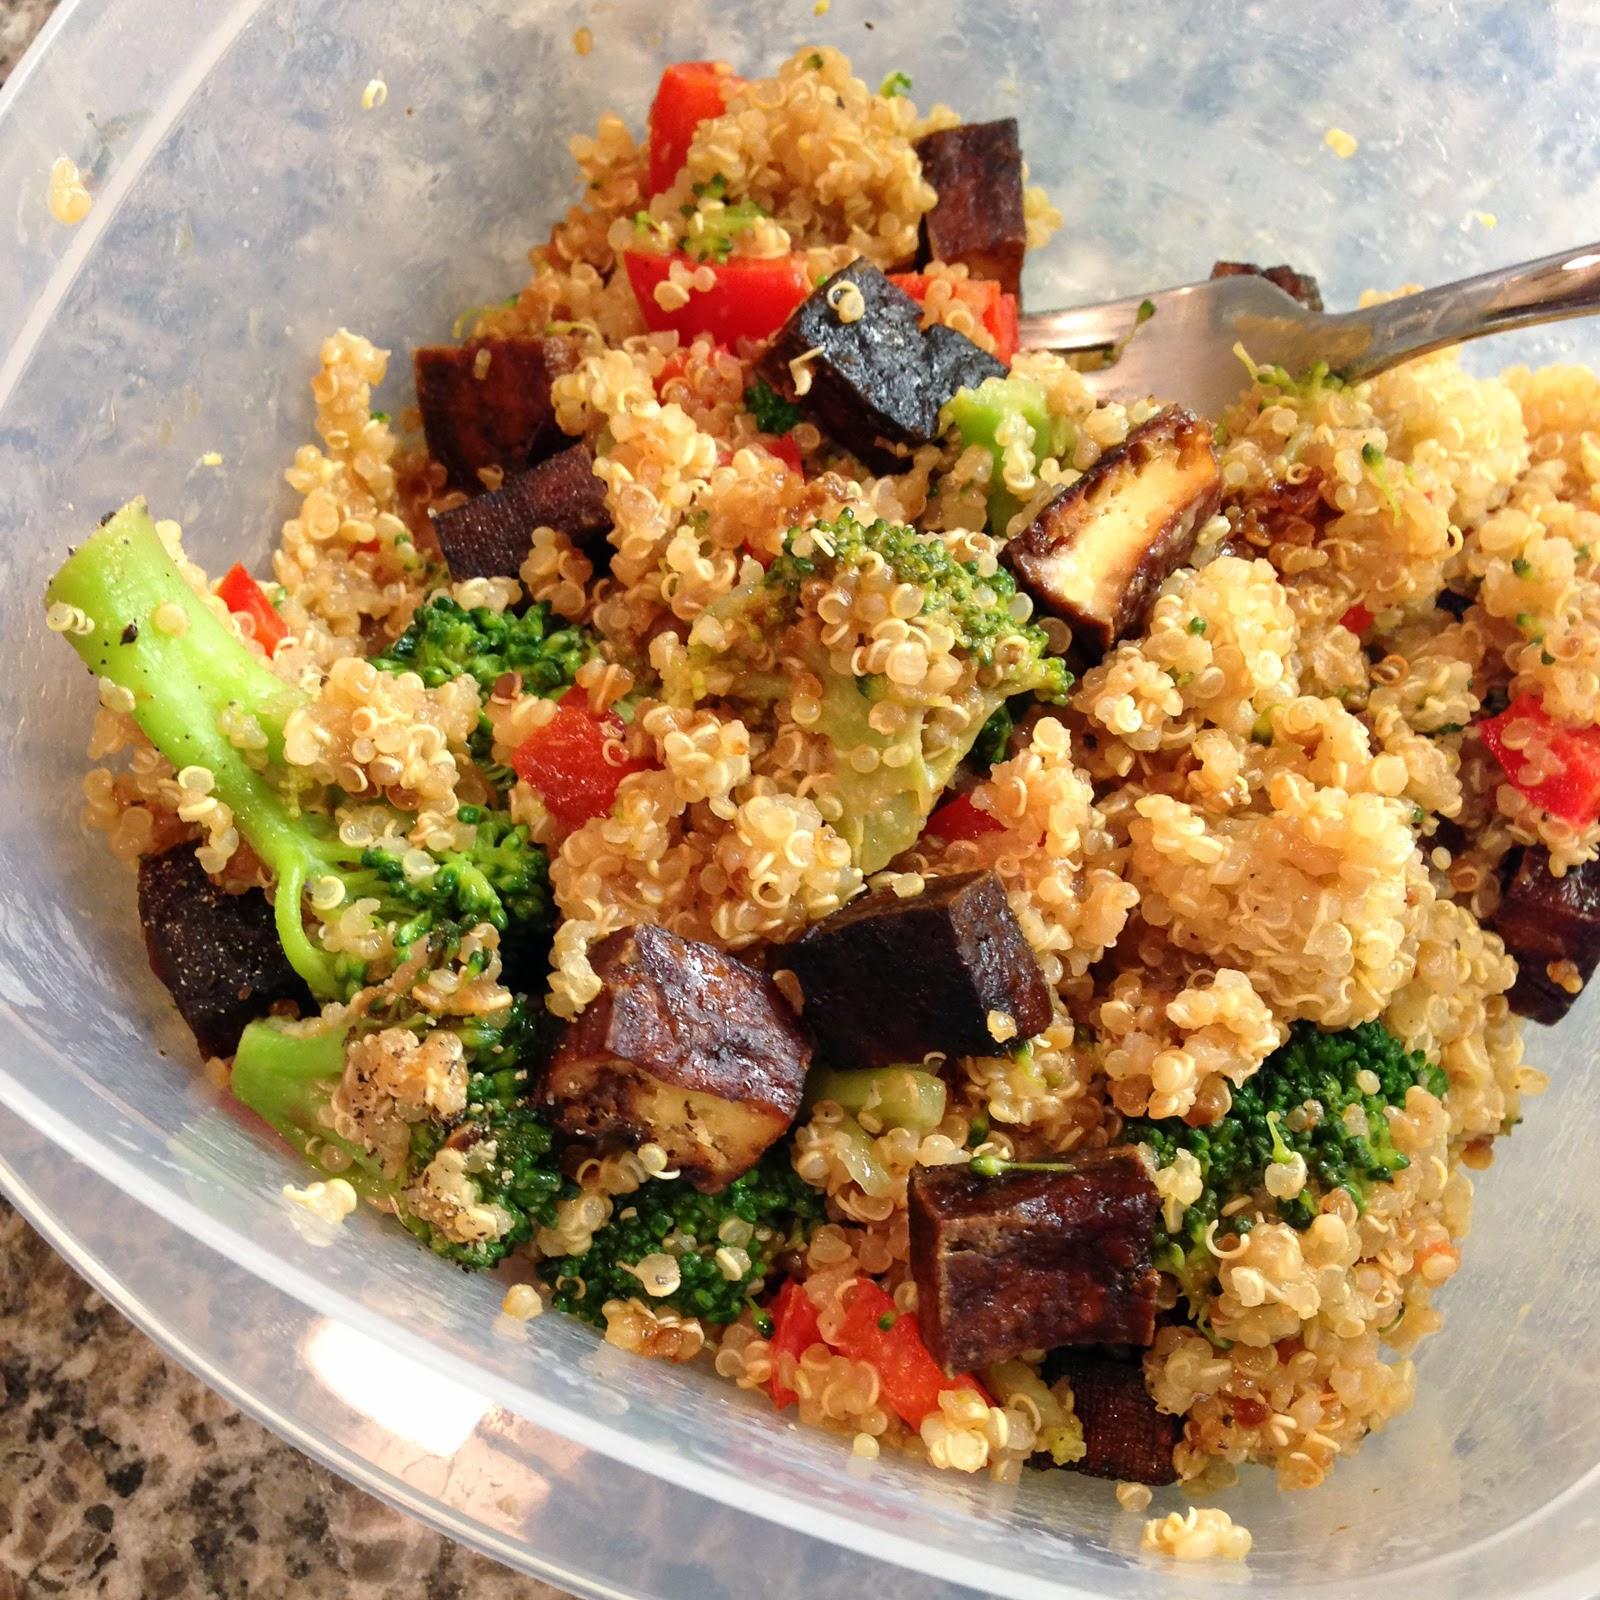 Peanutty Quinoa, Tofu, and Broccoli Bowls